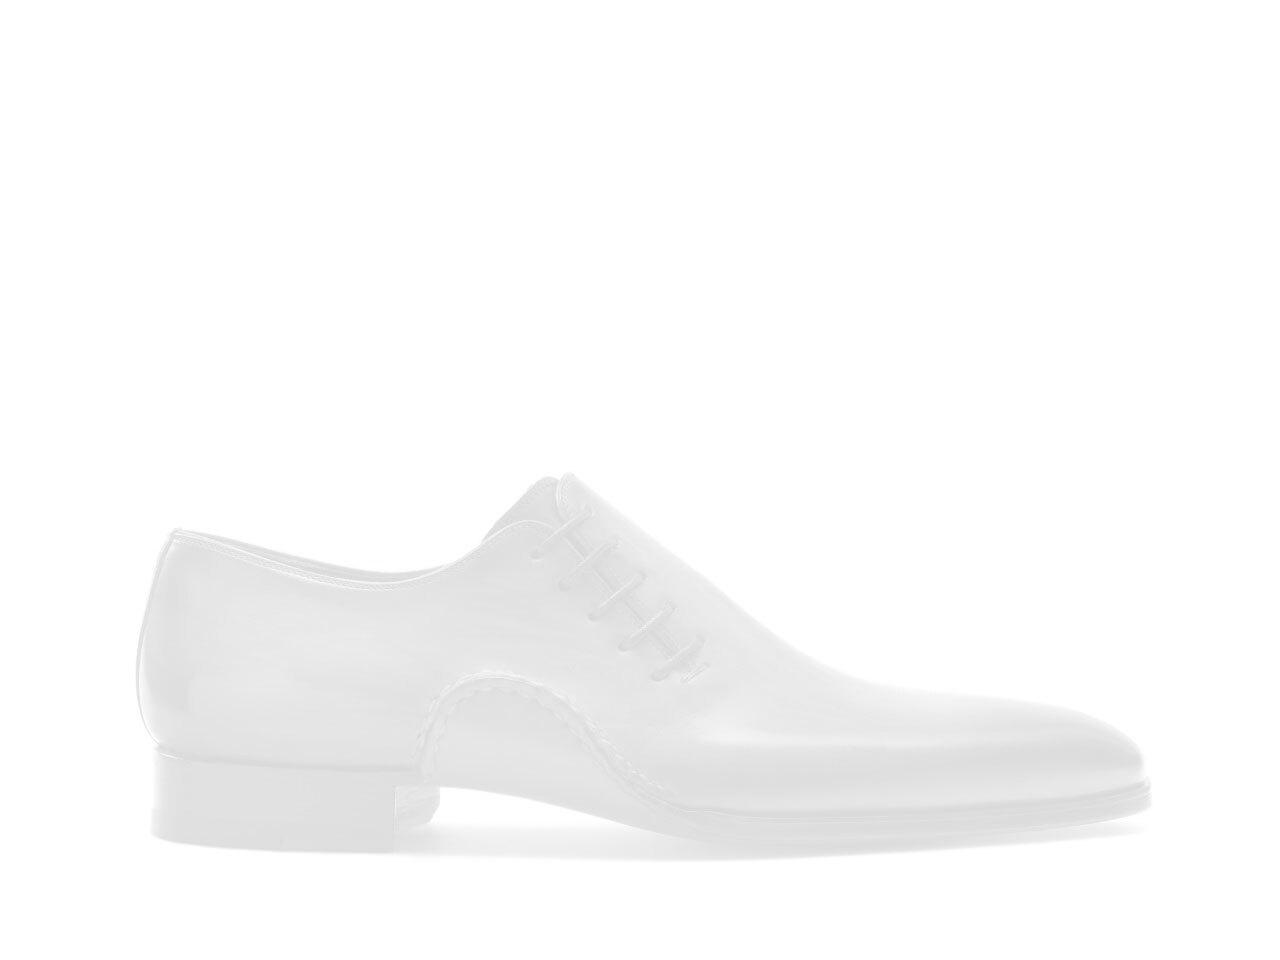 Magnanni Casual Dress Sock Charcoal Grey Men's Casual Socks